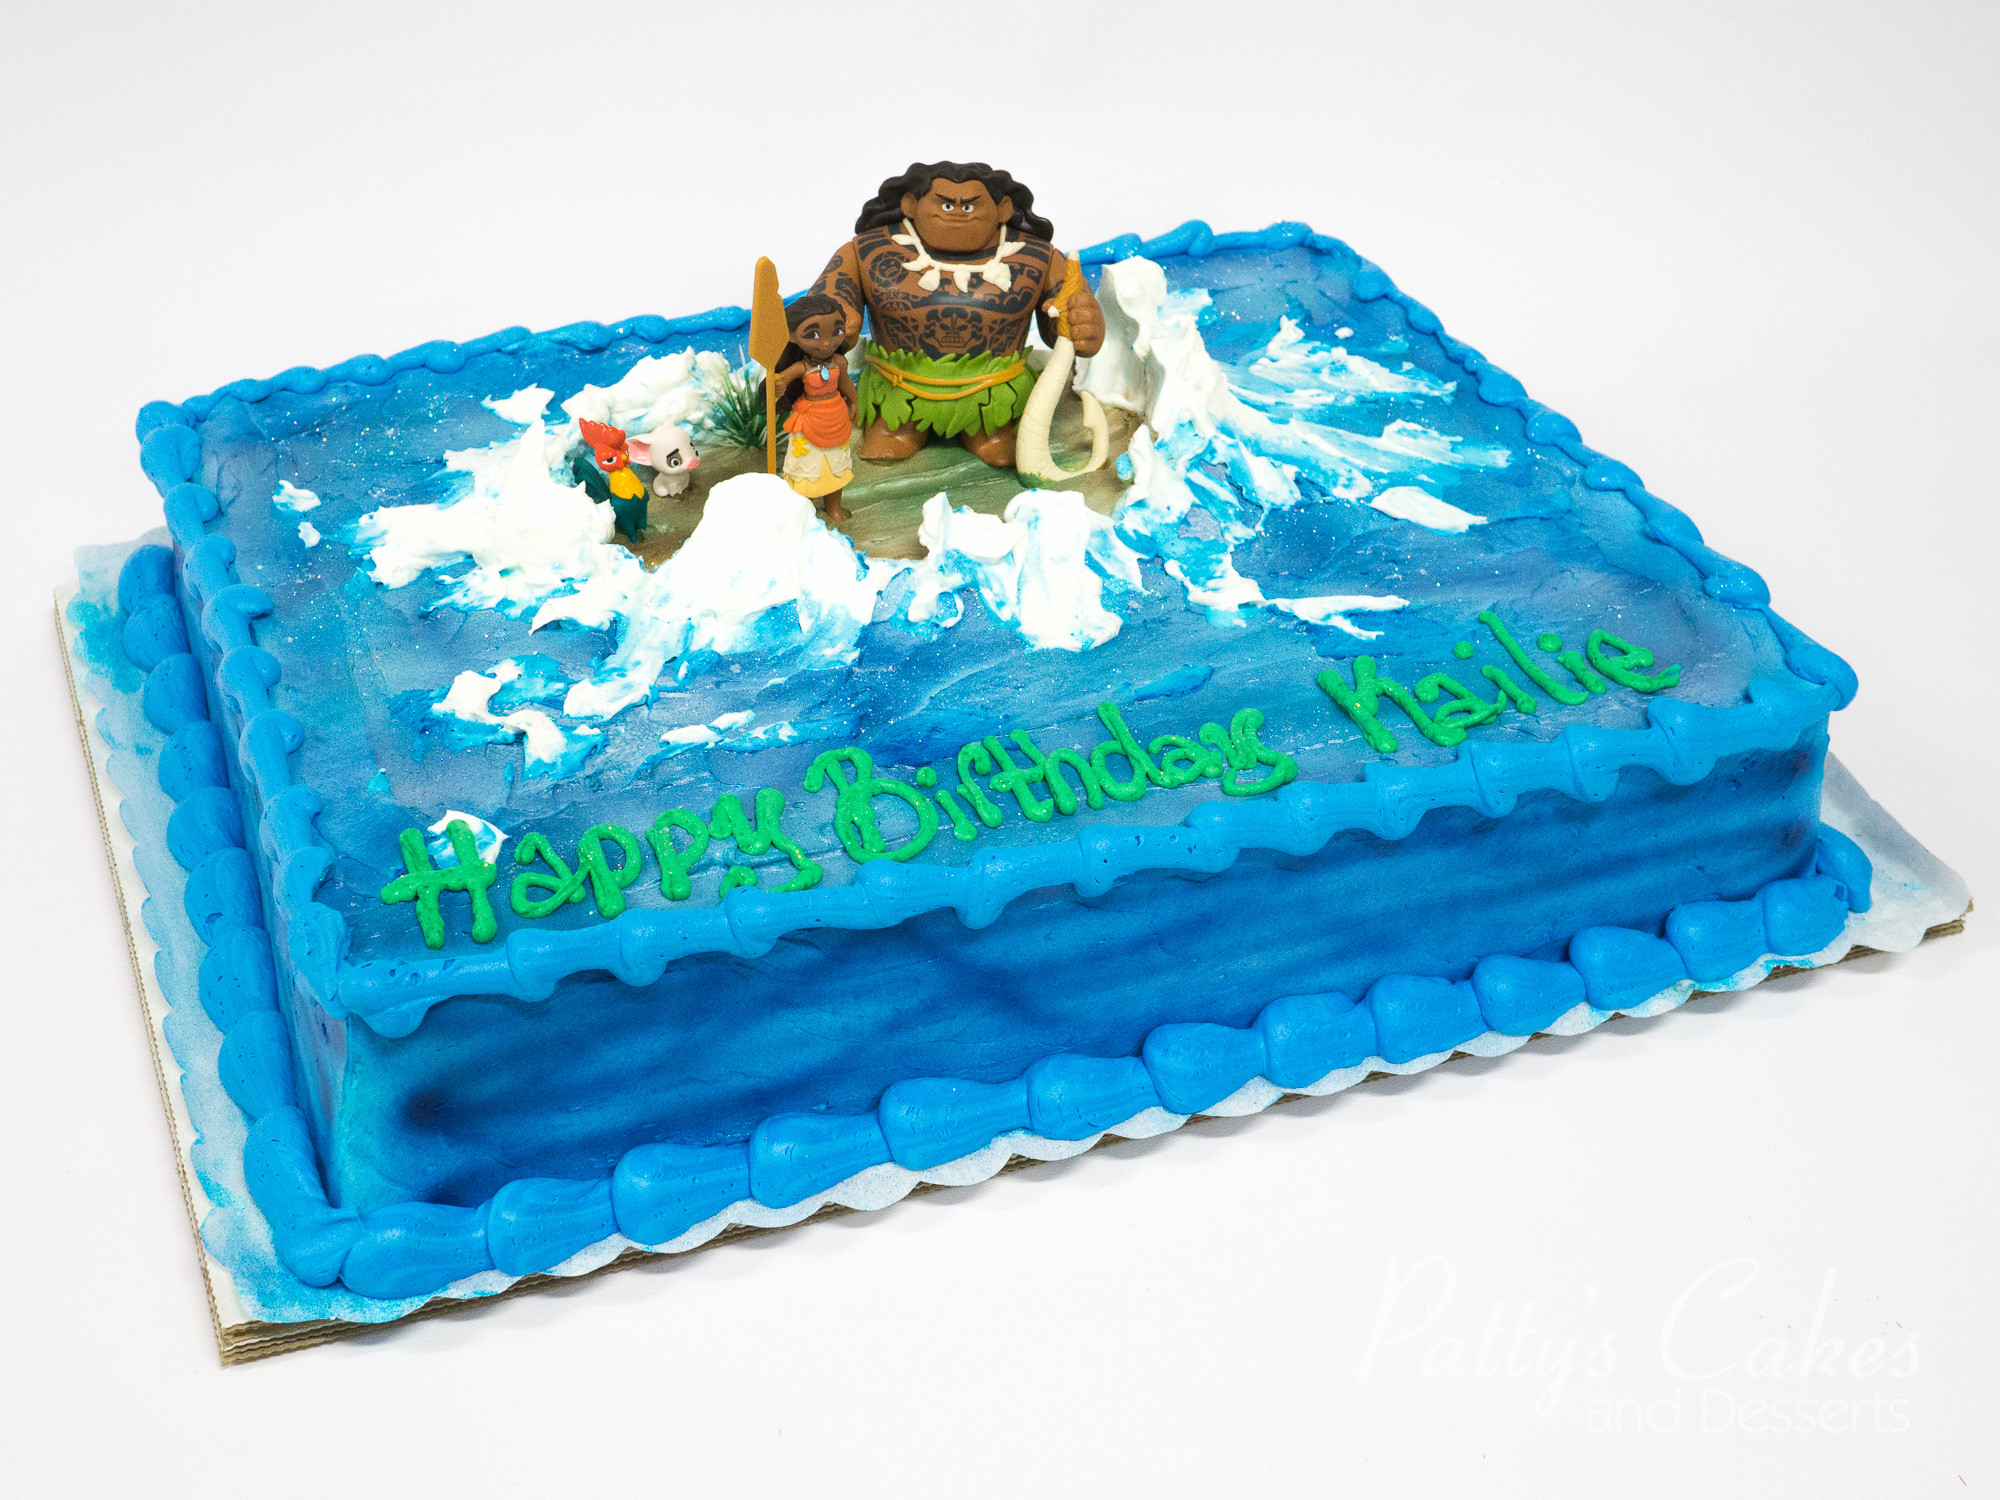 Moana Sheet Cake  of a moana birthday cake Patty s Cakes and Desserts